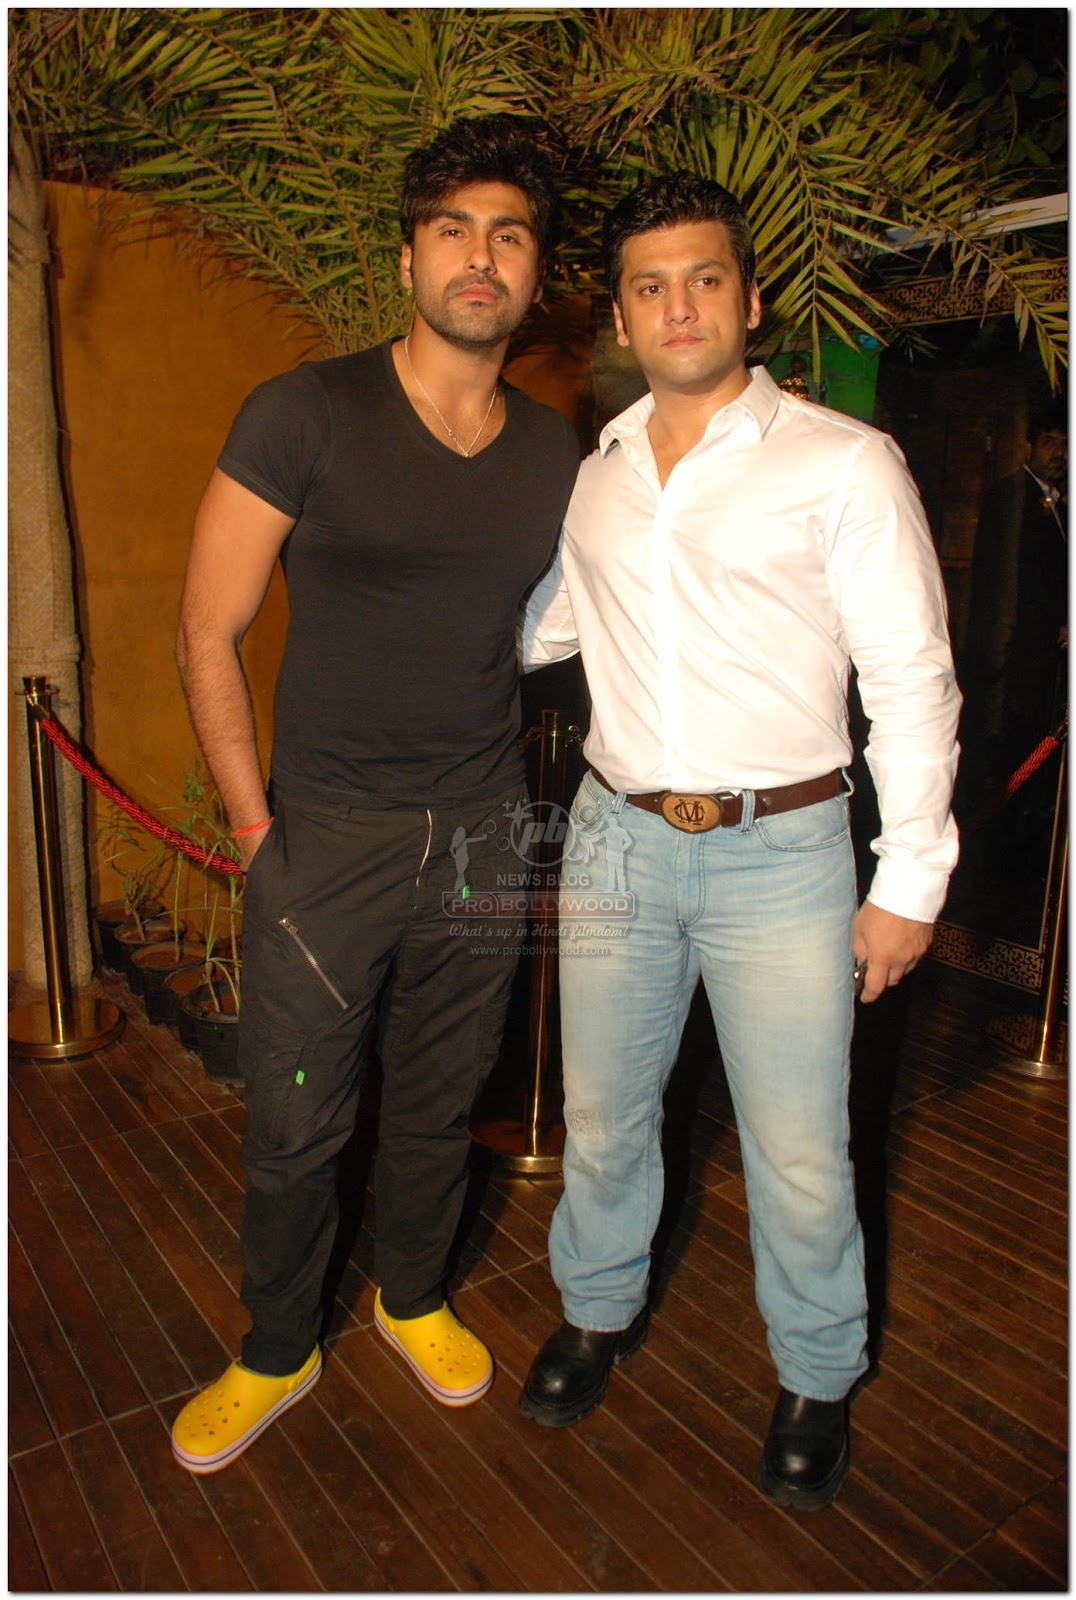 http://1.bp.blogspot.com/-7PZRvmrWpzA/Tl5NBzL9FwI/AAAAAAAAc4g/Lgc5WuDn3ow/s1600/Pro-Bollywood-Ali-Reza-6.jpg